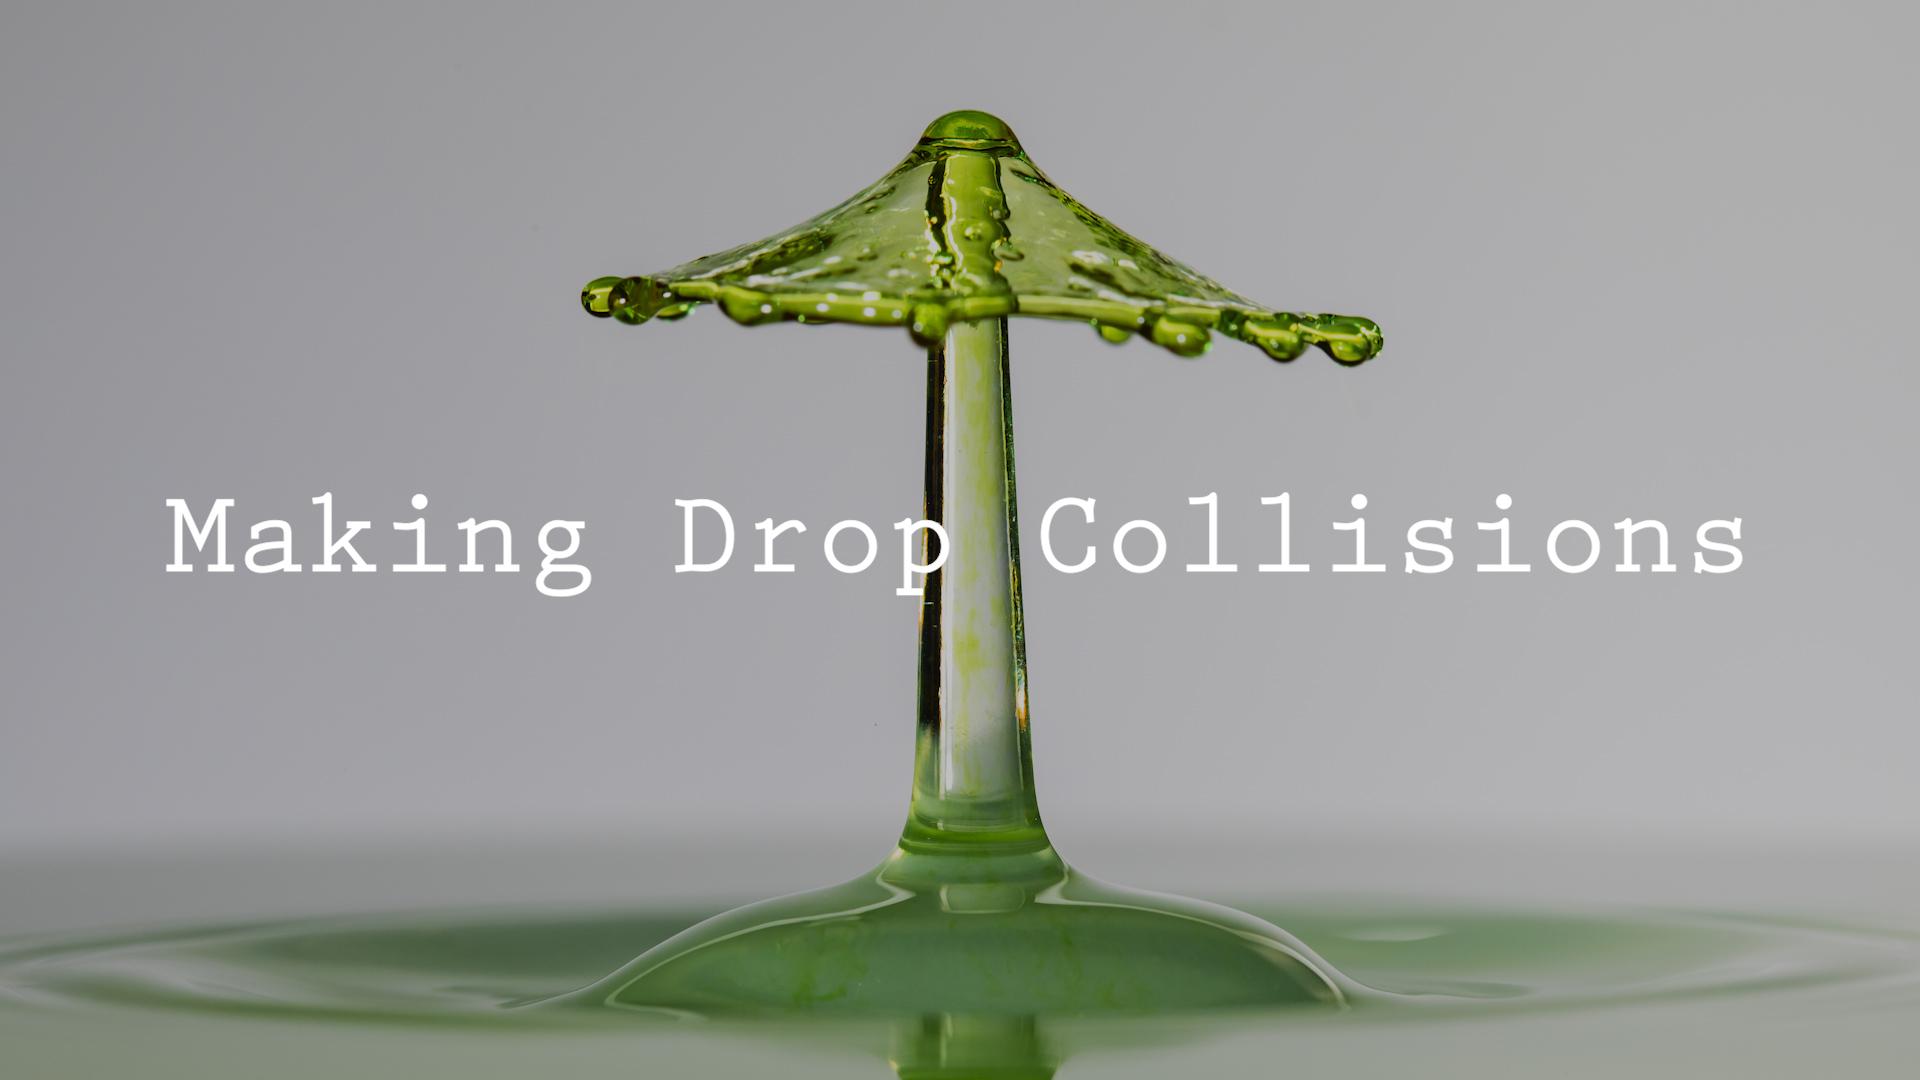 Making Drop Collisions.jpg